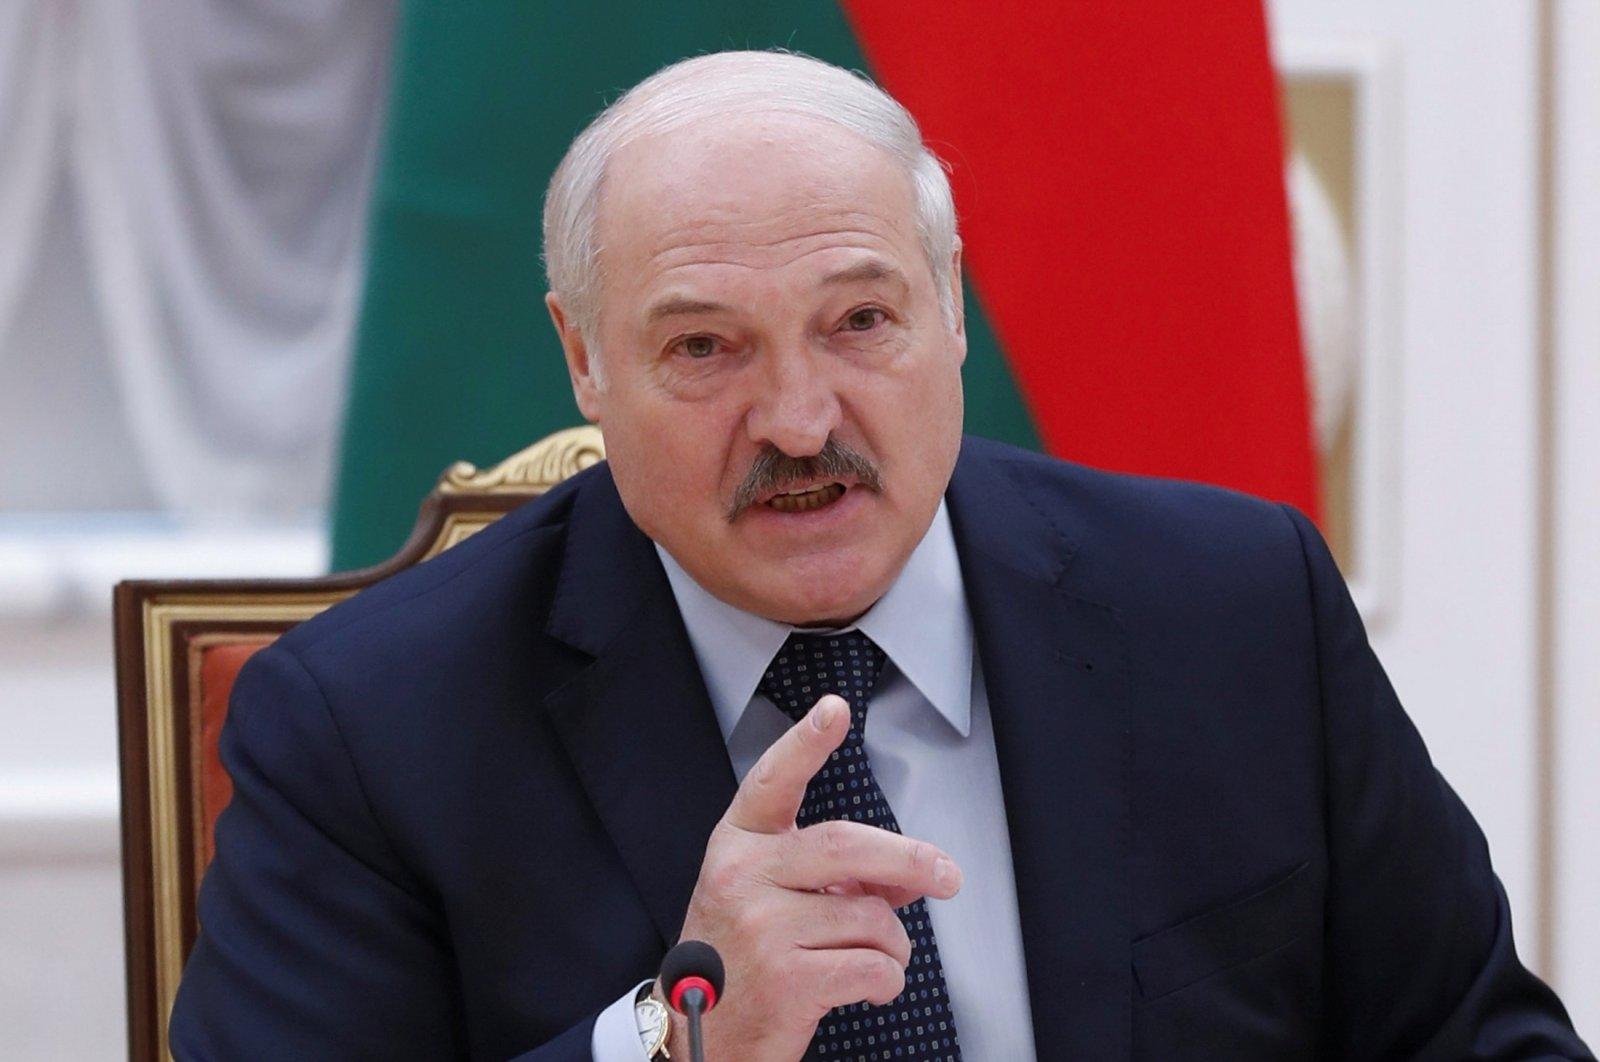 BelarusianPresidentAlexanderLukashenkospeaks at Commonwealth of Independent States (CIS) Heads ofGovernmentCouncil inMinsk, Belarus May 28, 2021. (Reuters Photo)